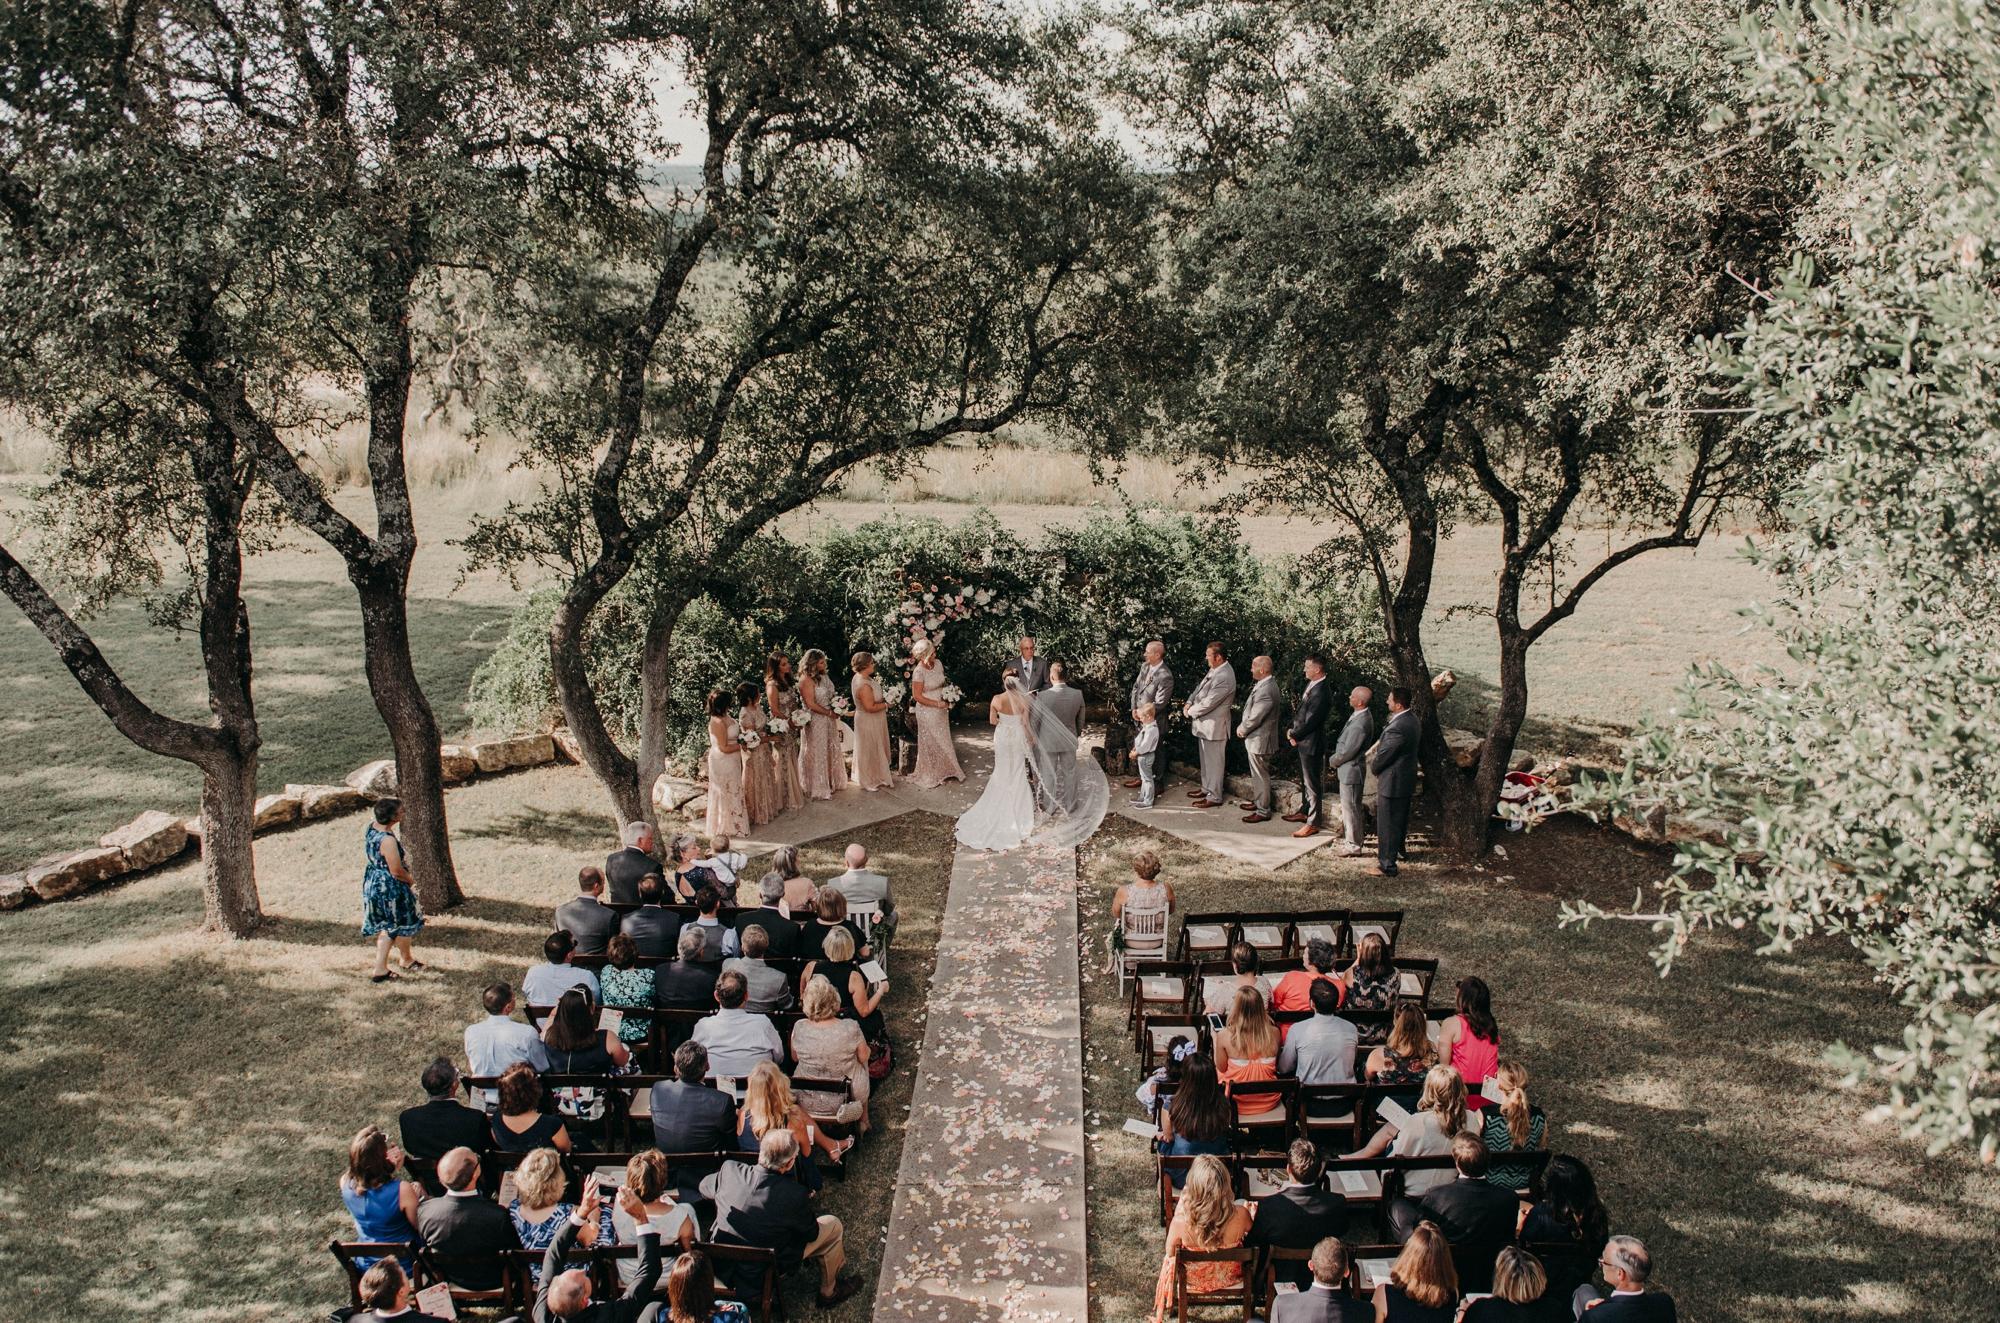 austin-texas-vista-west-ranch-wedding-photography-1778-photographie-16.jpg